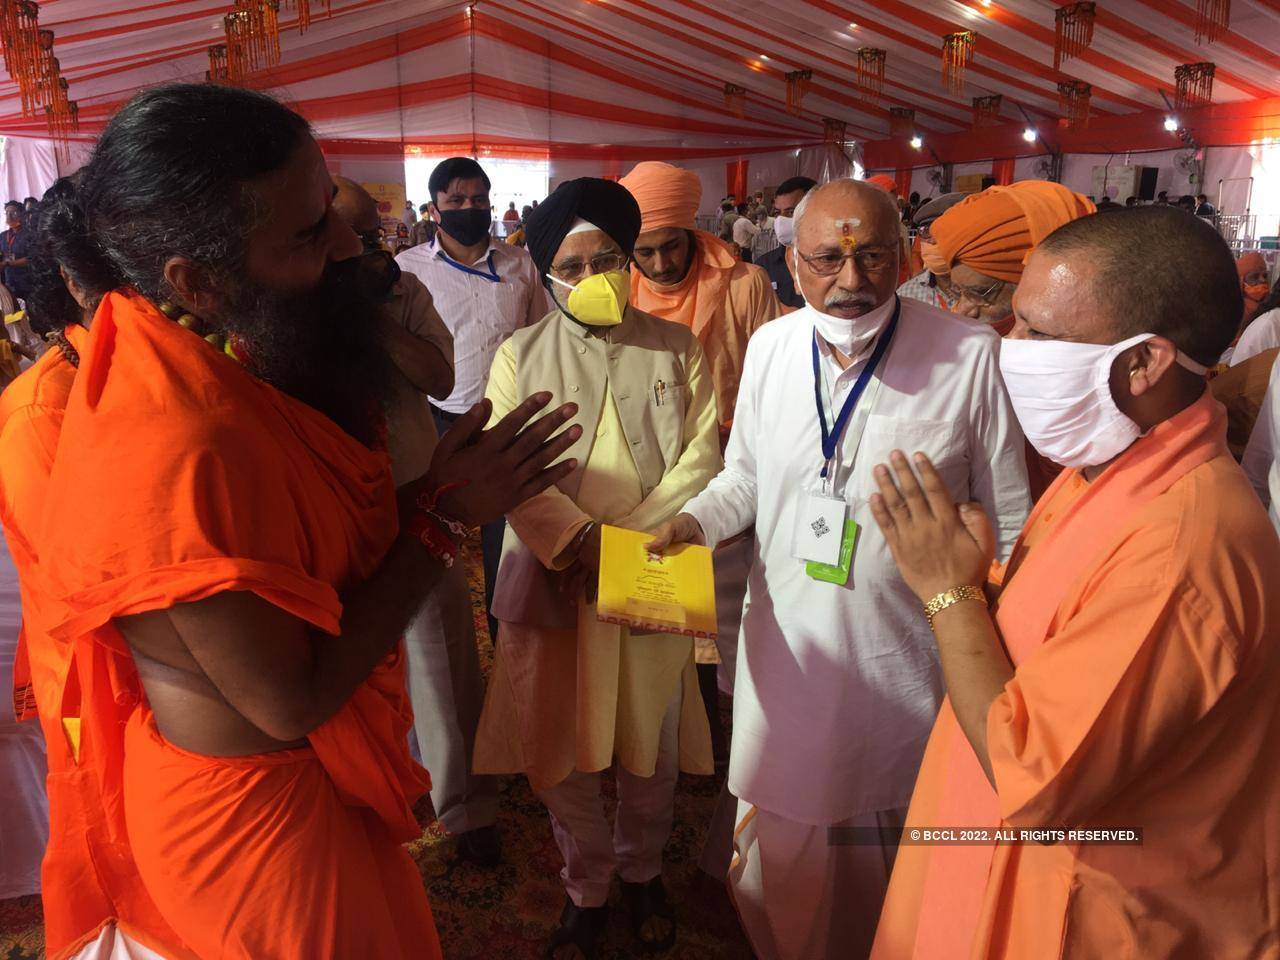 Bhoomi Pujan: UP CM Yogi Adityanath welcomes guests